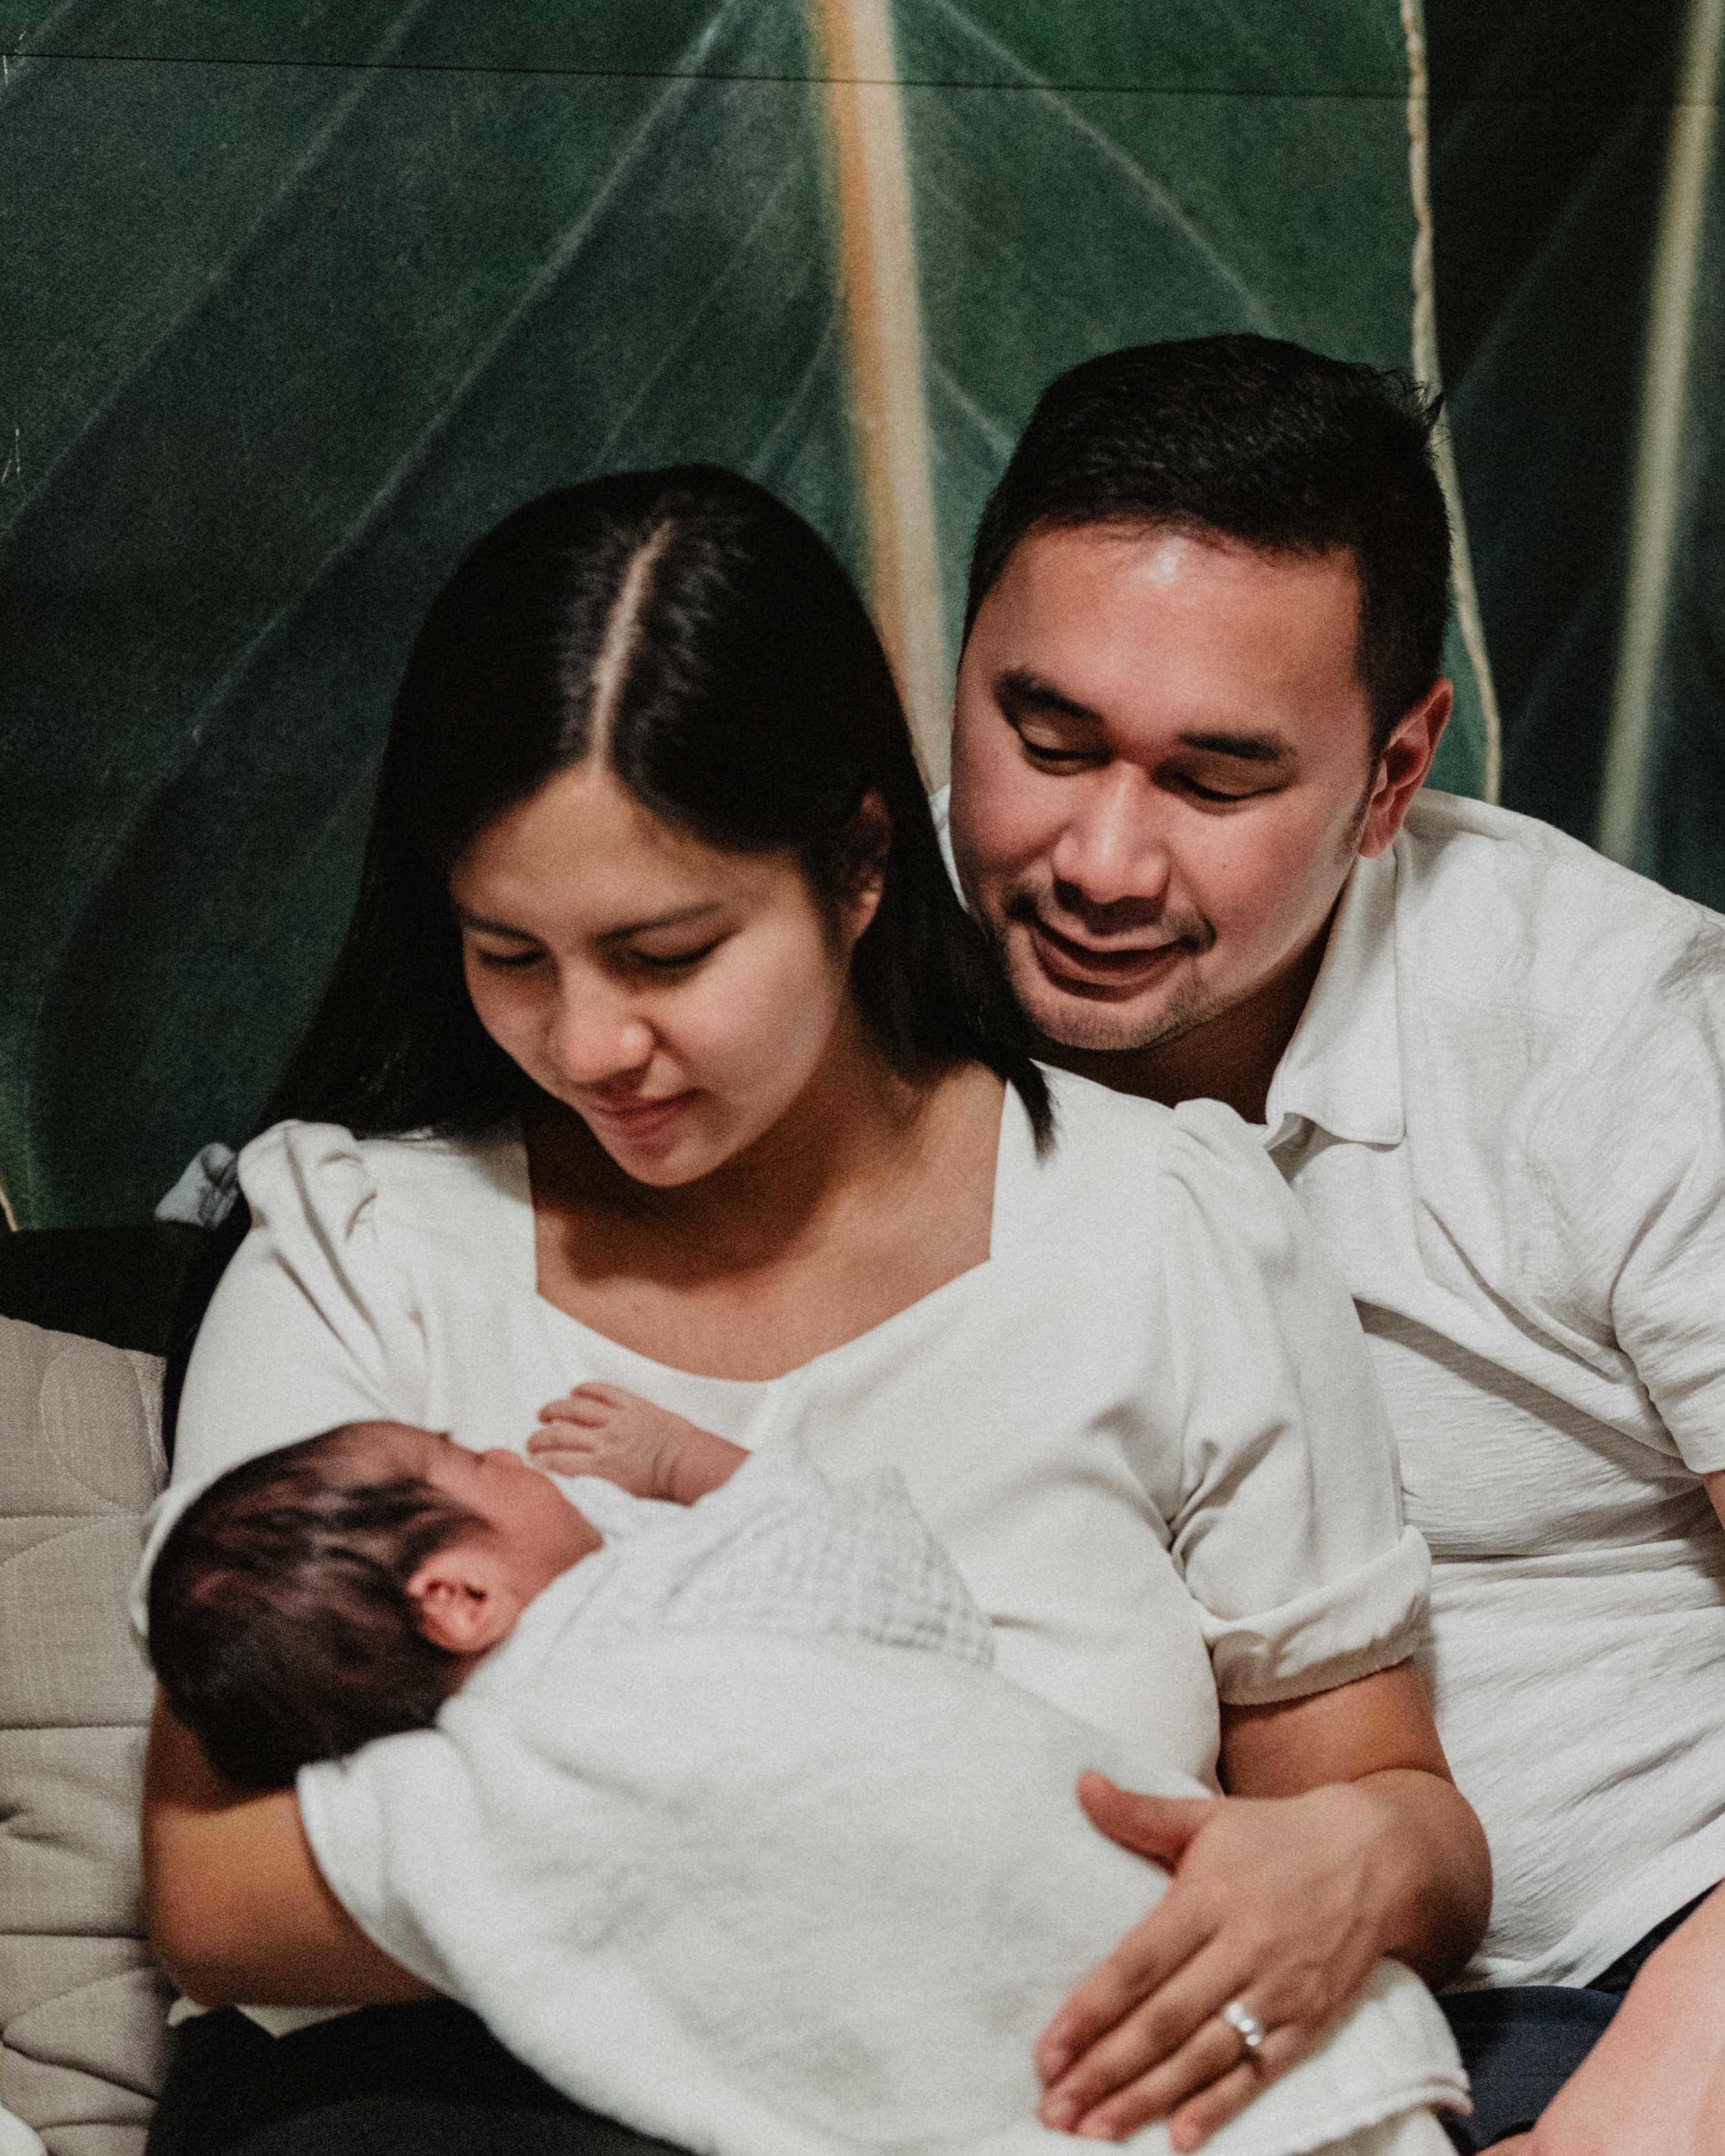 babyKai-Newborn-MicaMijaresPhotography-42.jpg